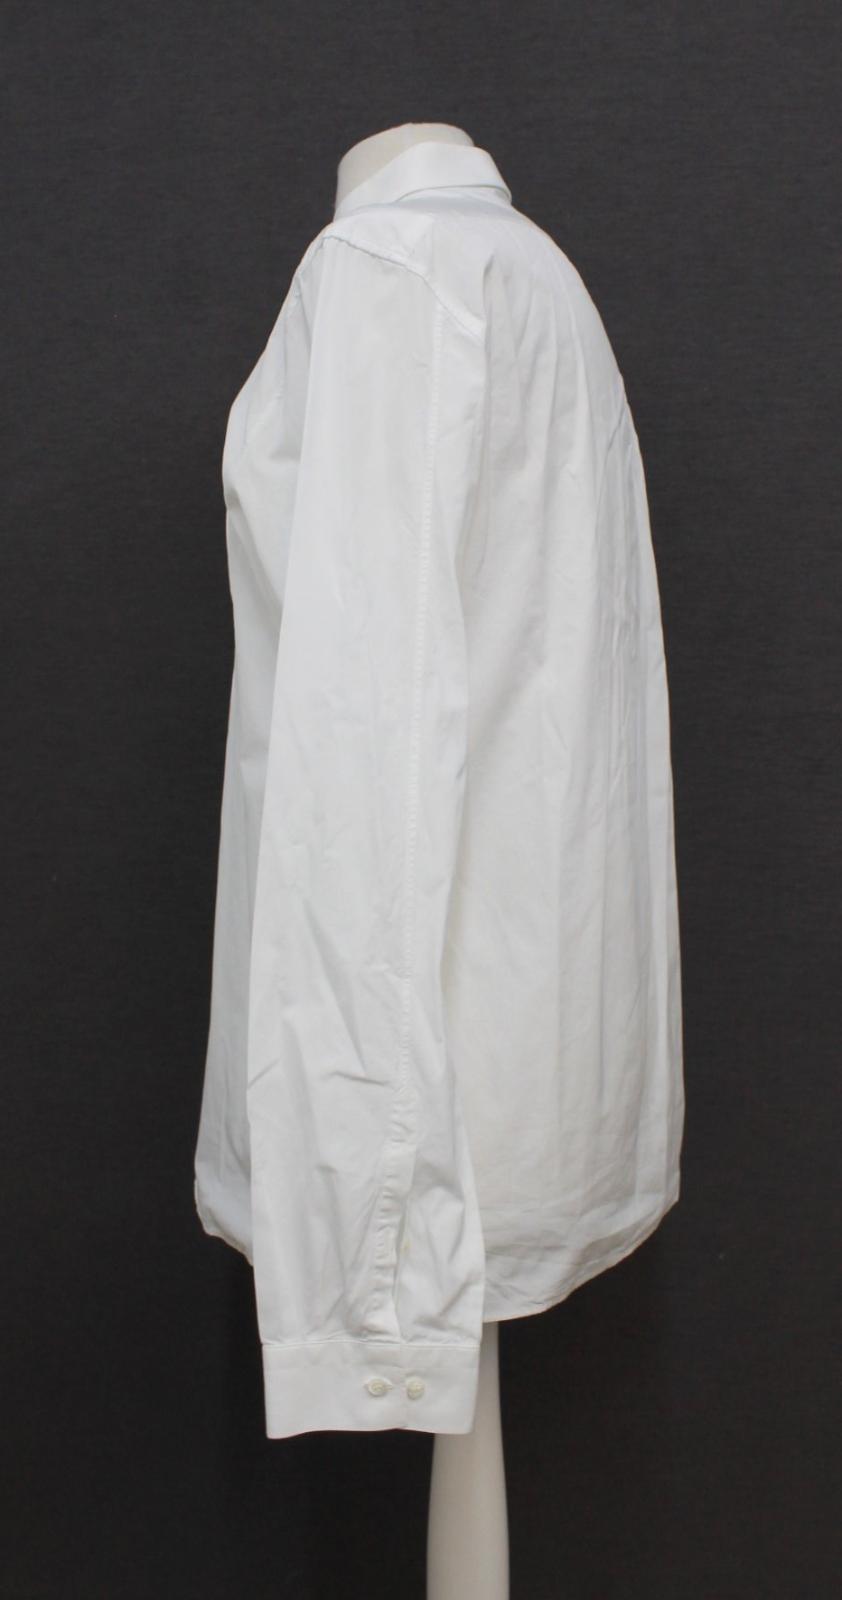 Neil-Barrett-para-hombre-calce-cenido-de-algodon-blanco-cuello-flash-camisa-de-manga-larga-talla-17 miniatura 6